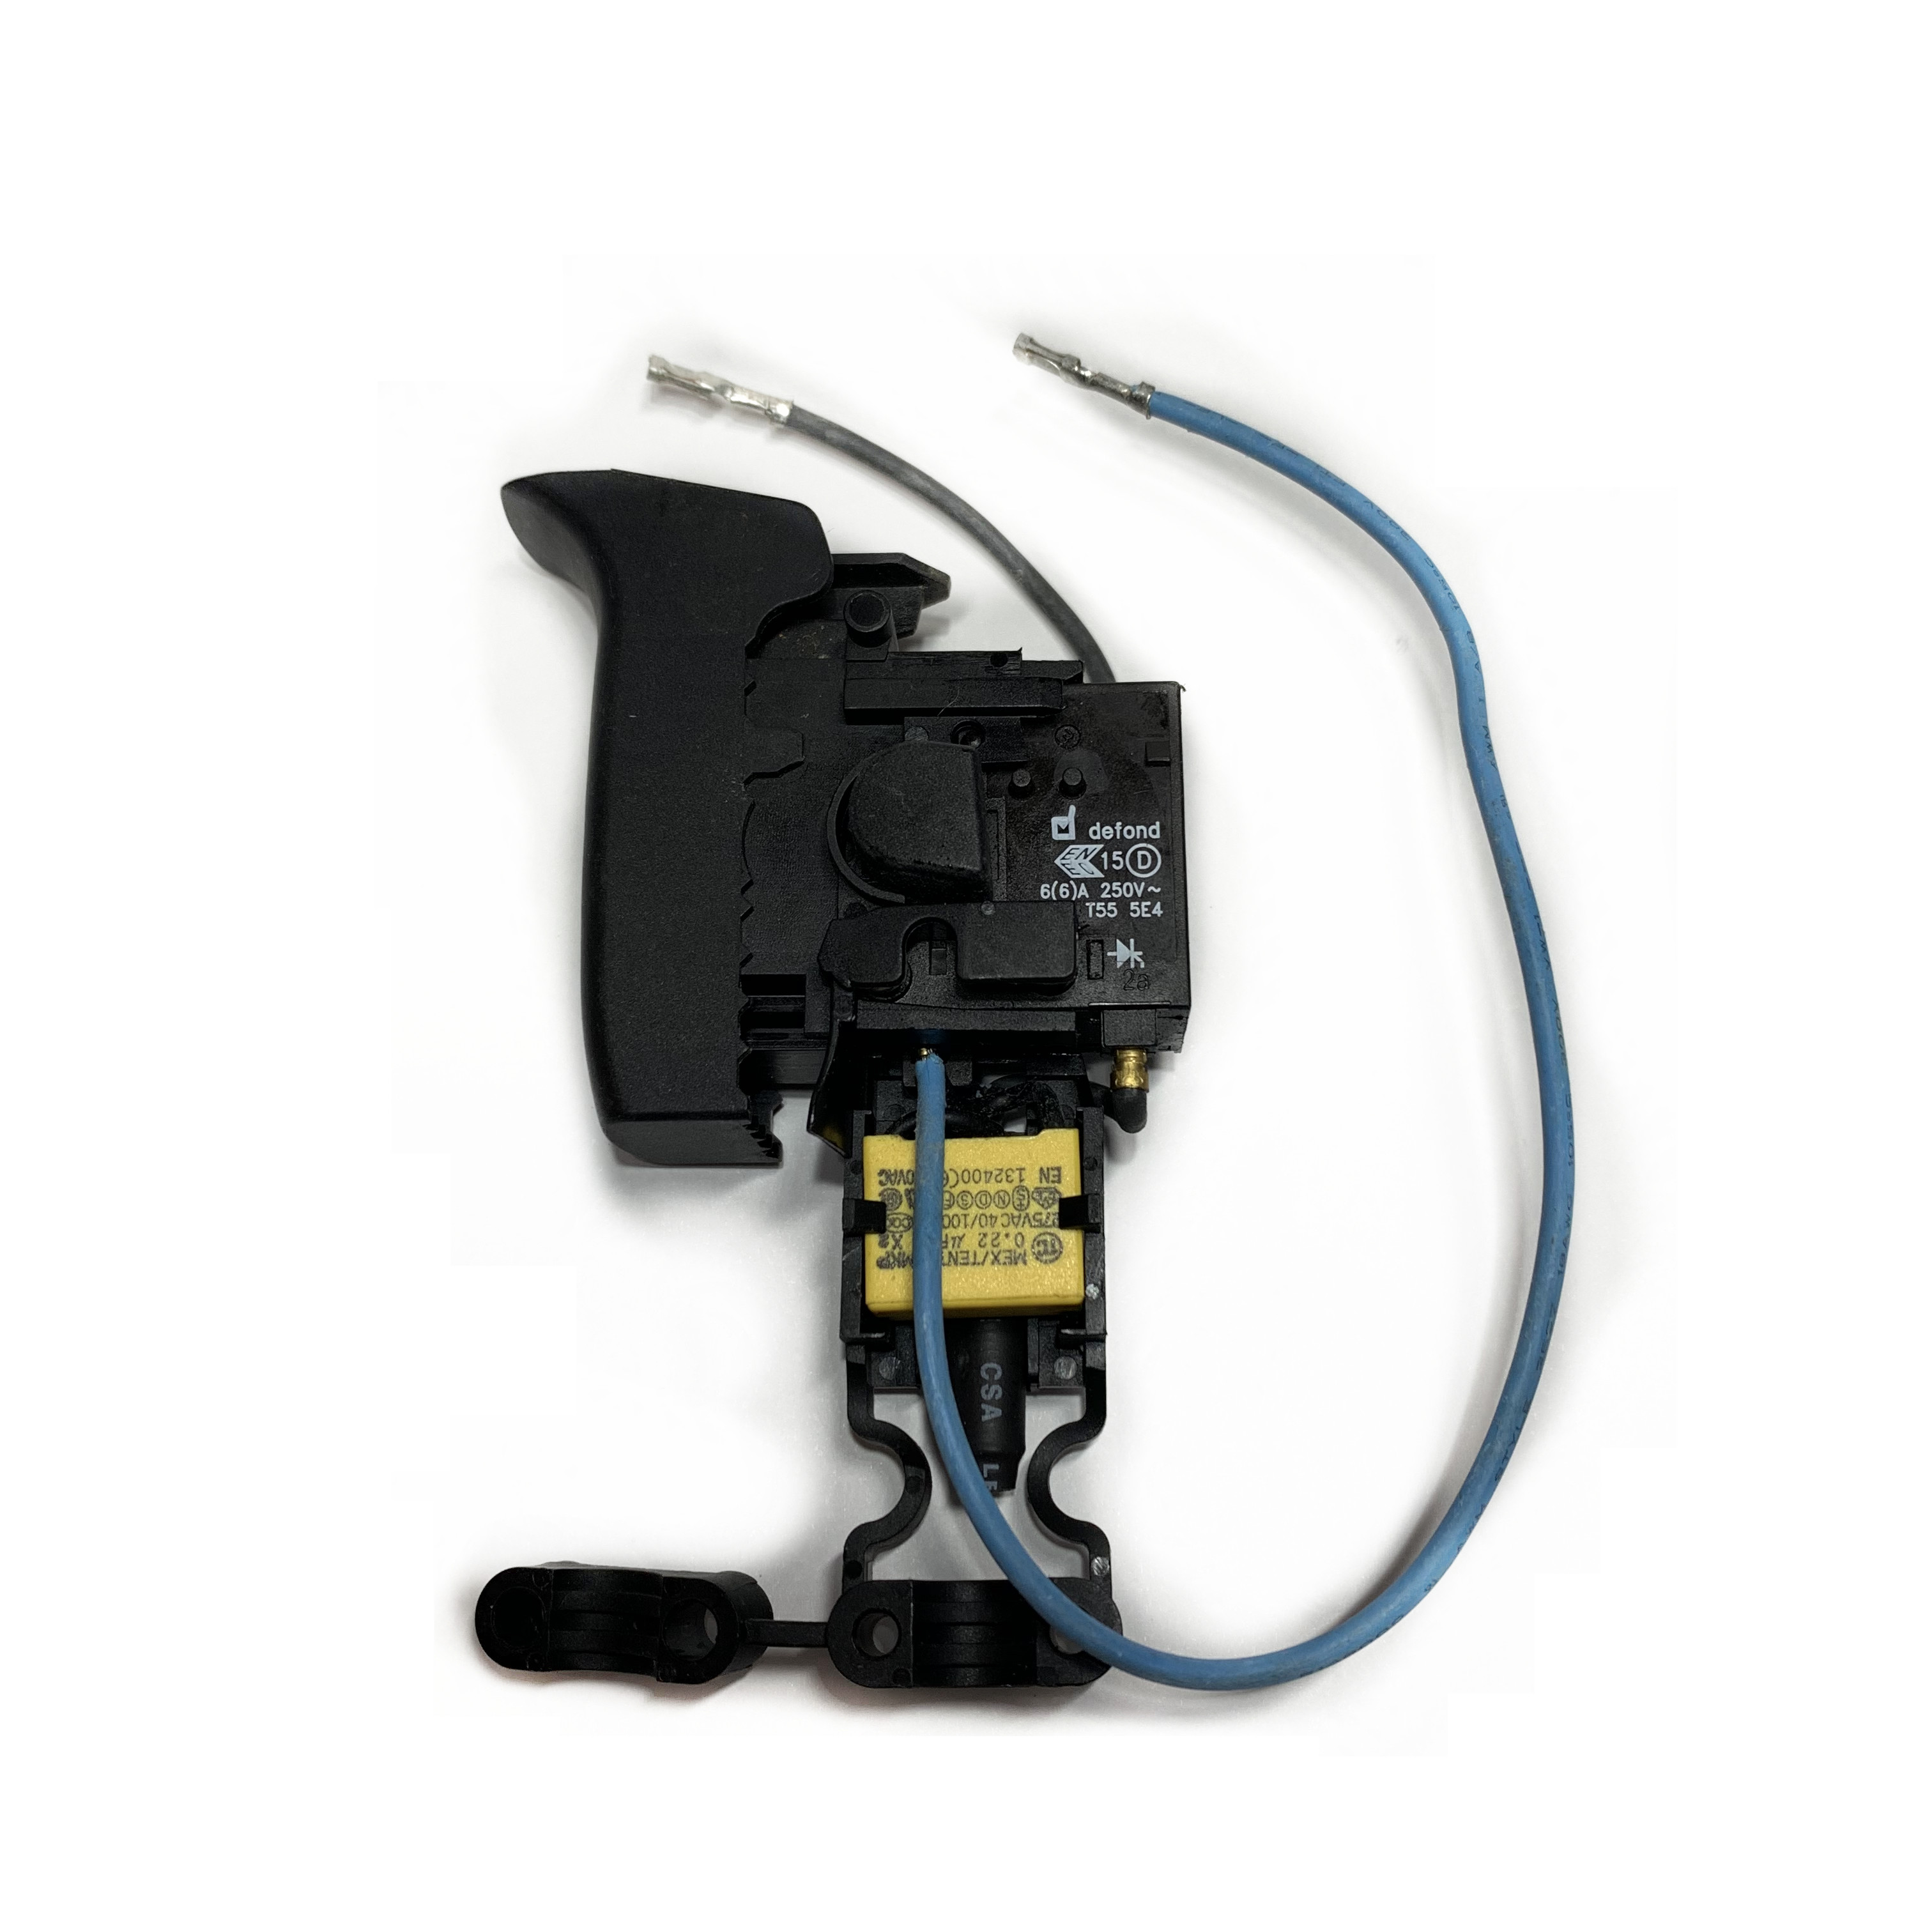 Switch Trigger Speed Controller Replacement For Hilti TE1 TE2 TE7 TE-1 TE-2 TE-7 TE 1 2 7 Drill Rotatory Hammer Spare Parts